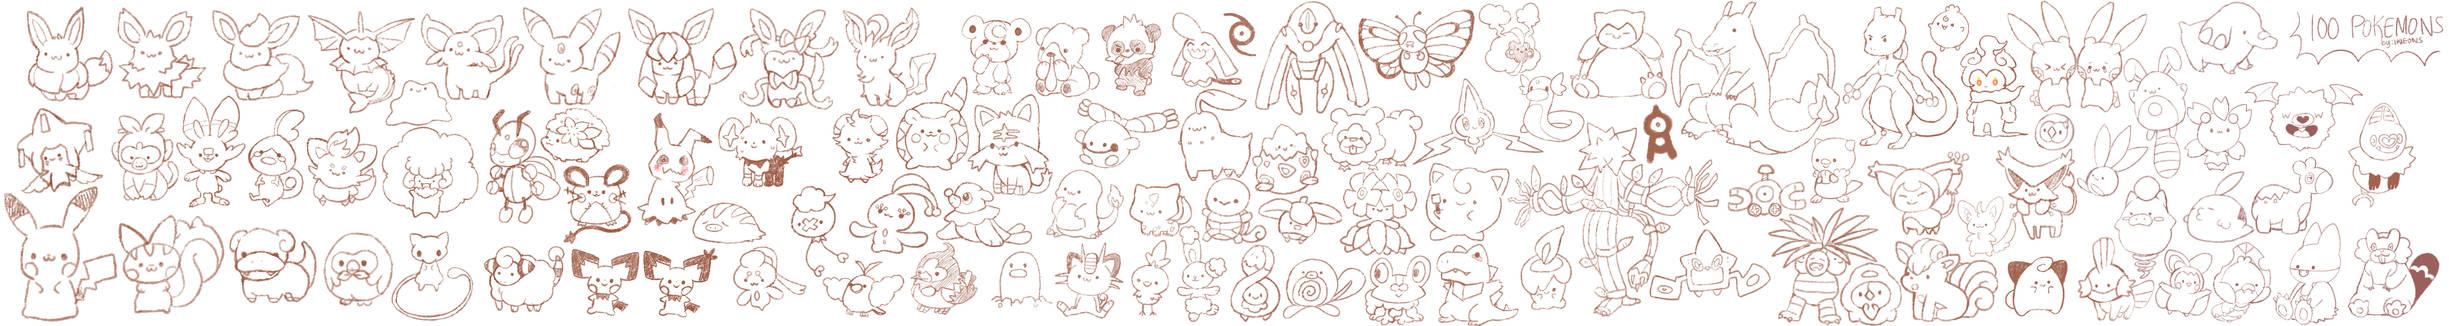 [Dlive] 100 pokemons!